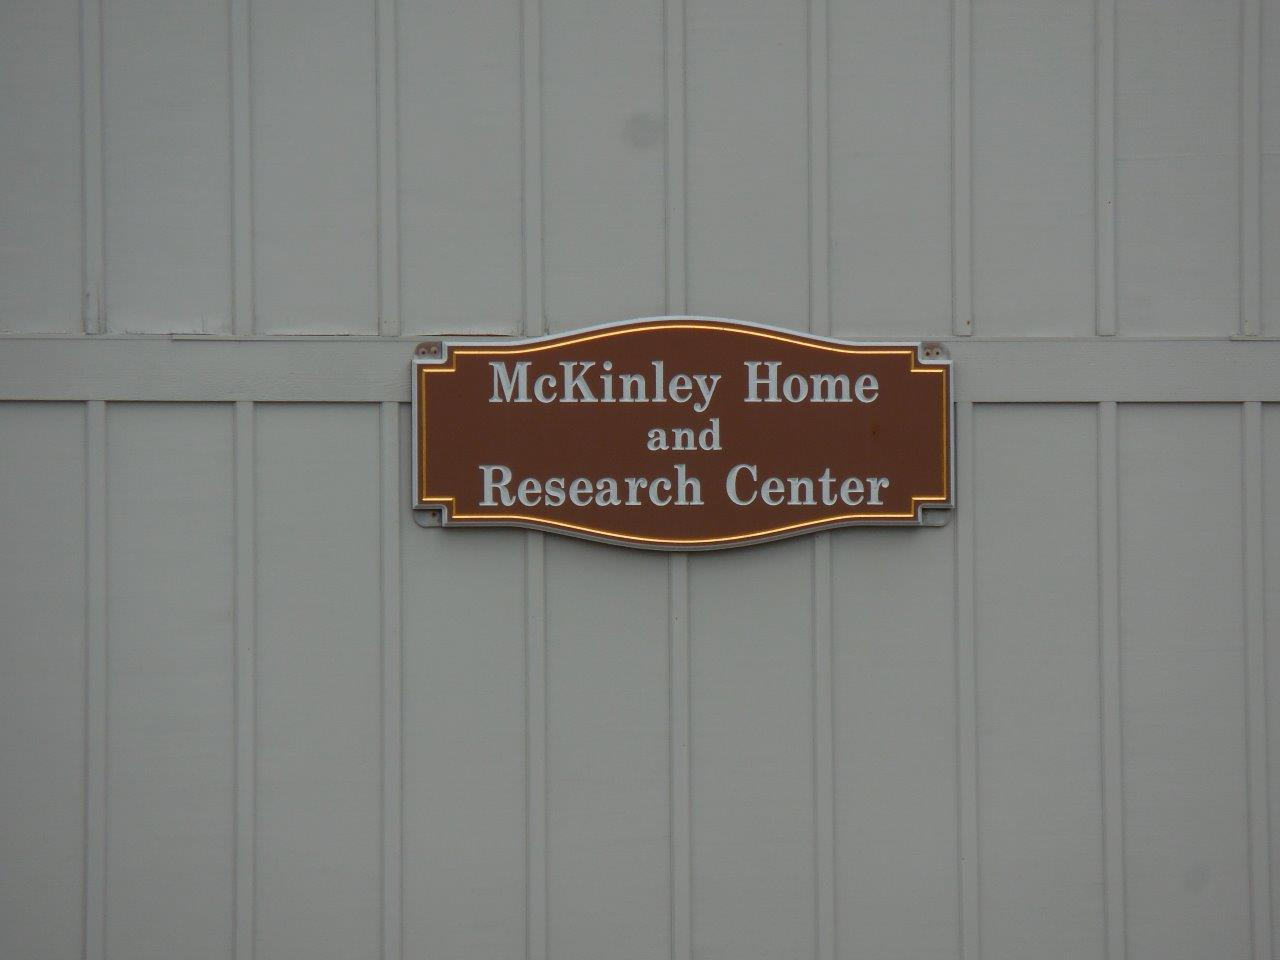 house where William McKinley was born